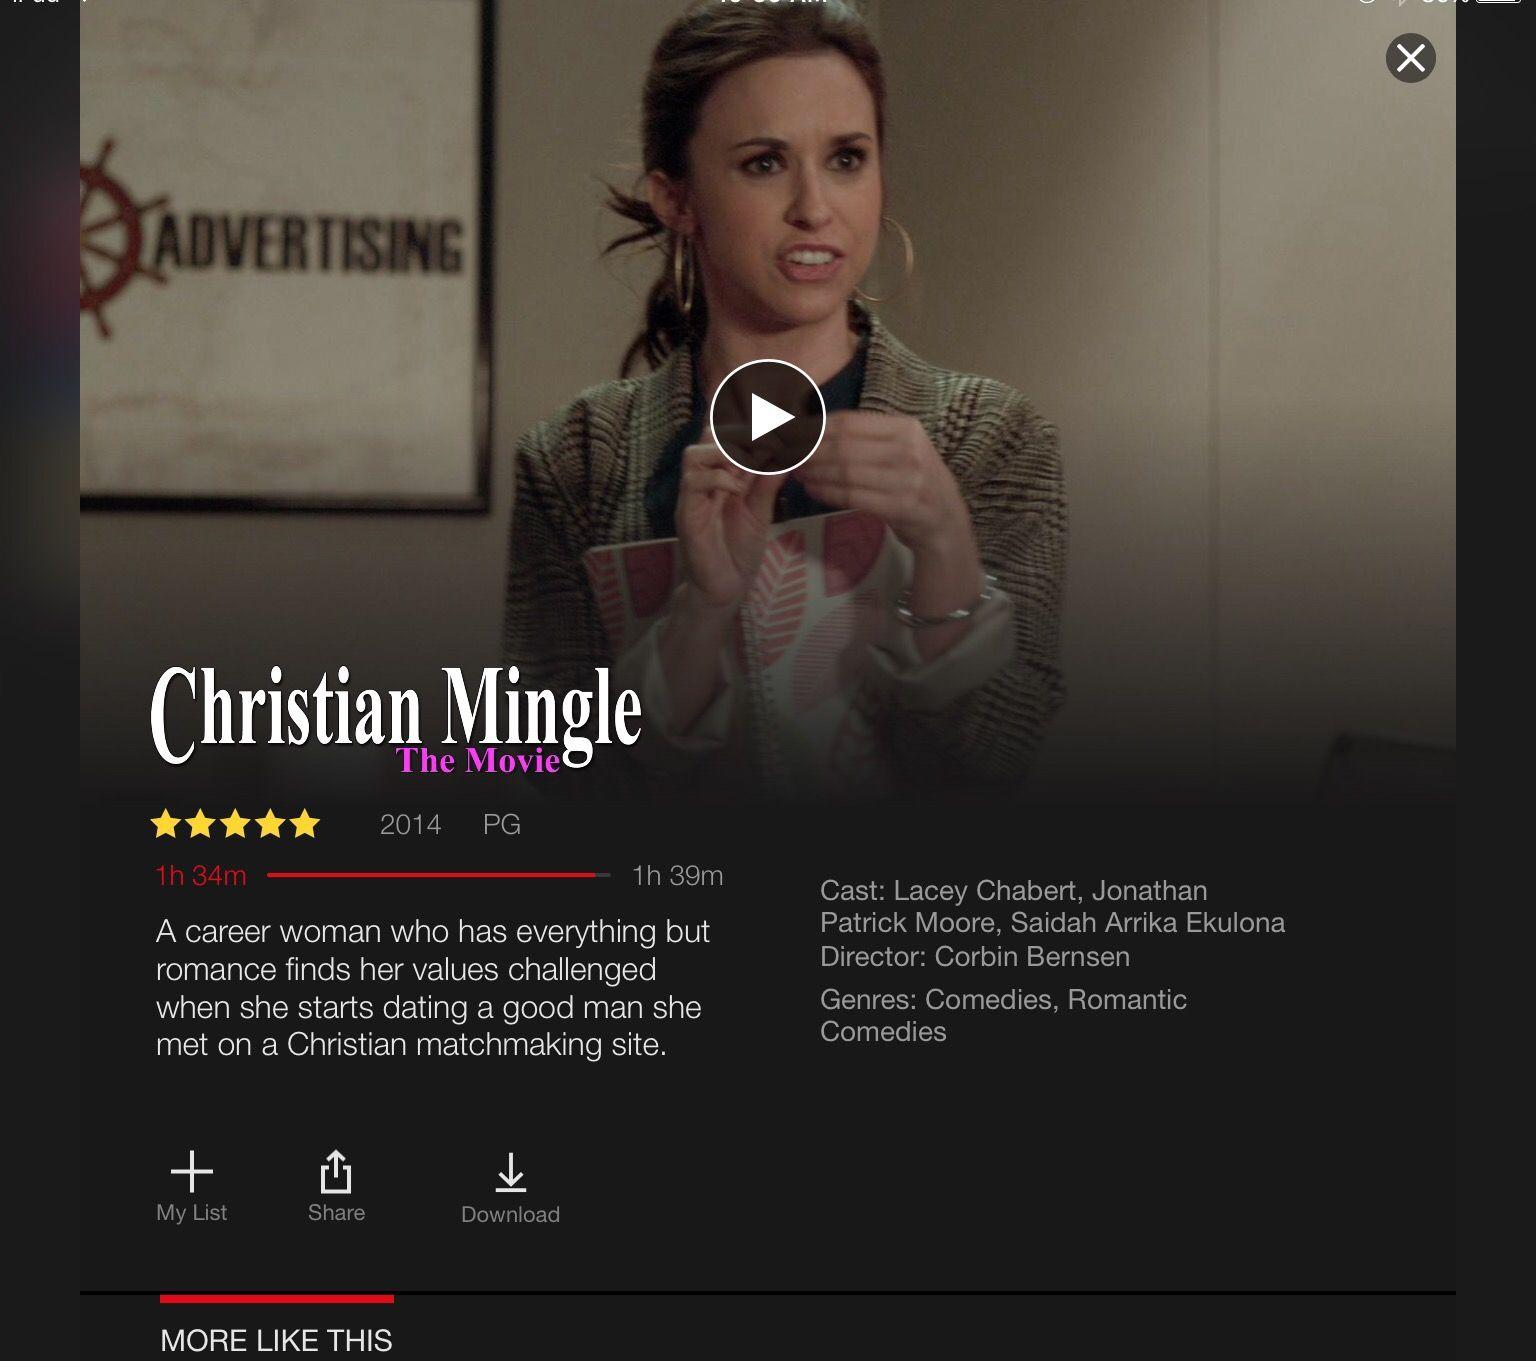 Christian mingle app download